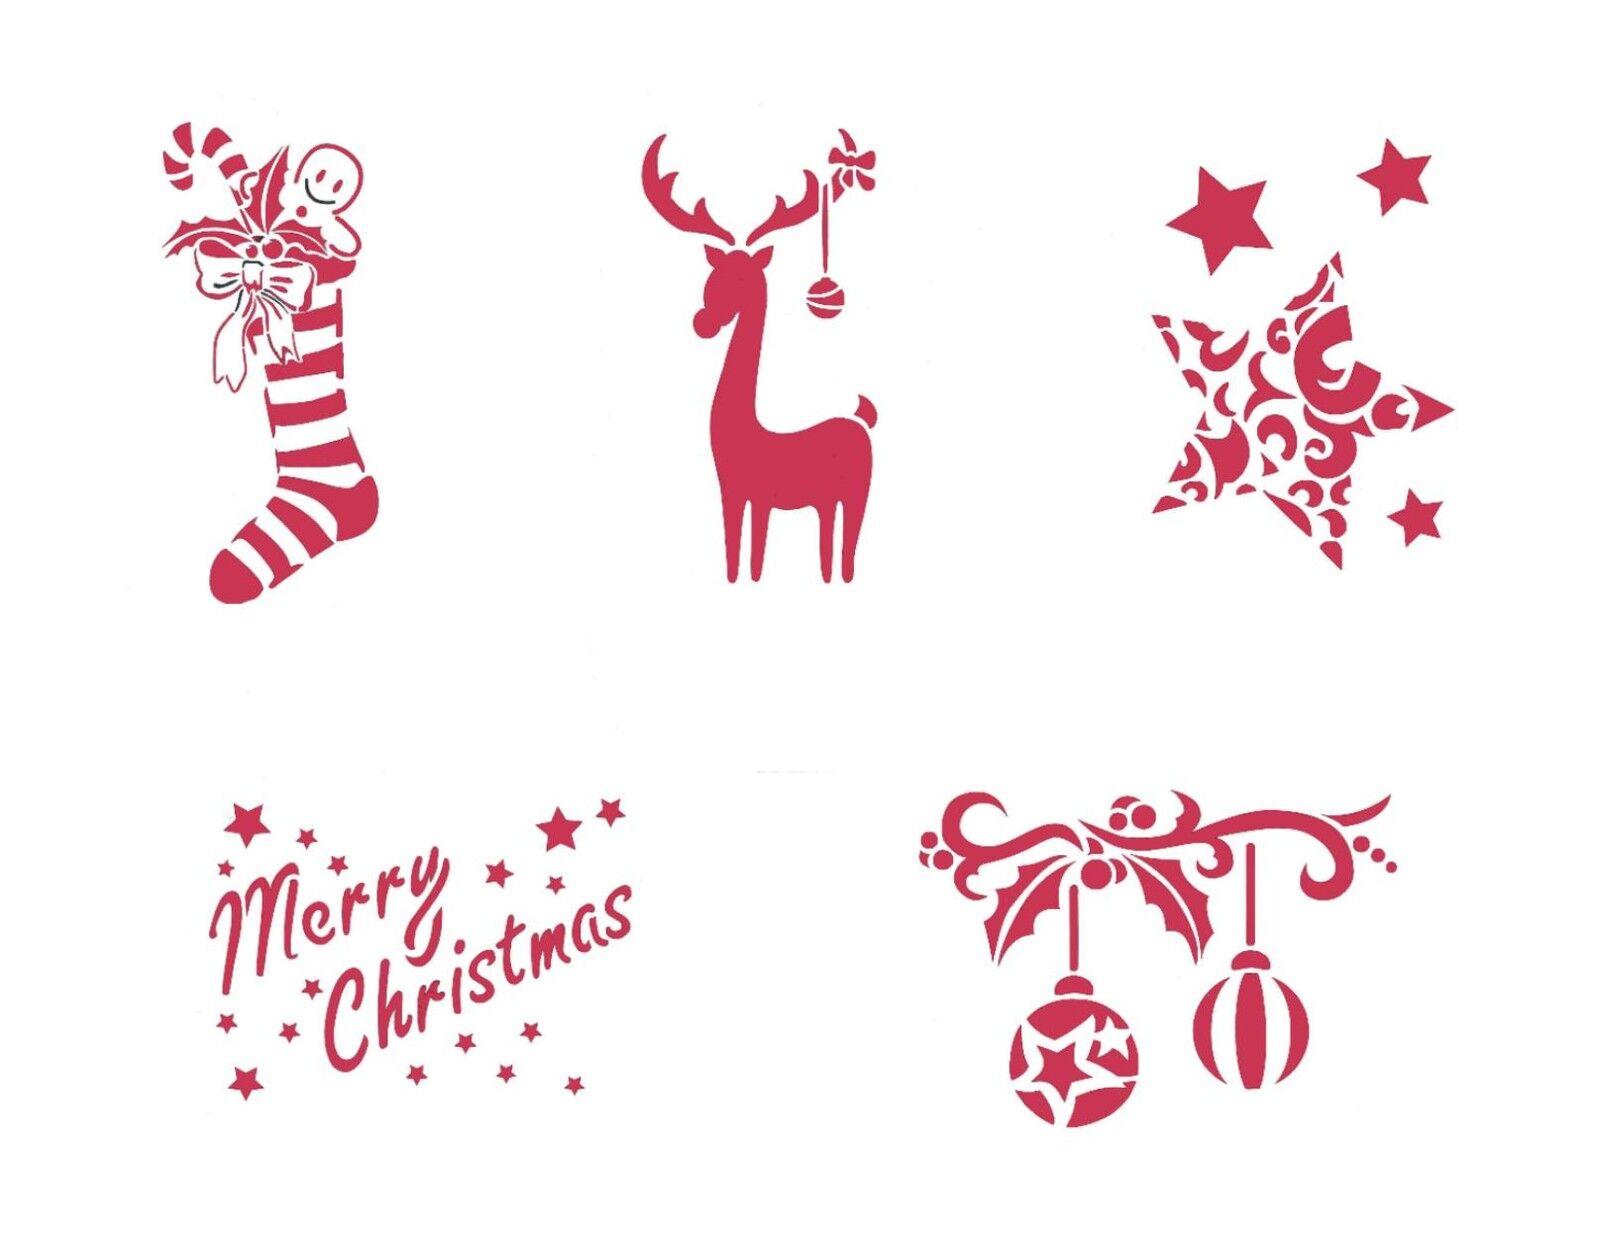 viva decor schablone textil wand motiv weihnachten sterne kugeln rentier dina5 ebay. Black Bedroom Furniture Sets. Home Design Ideas